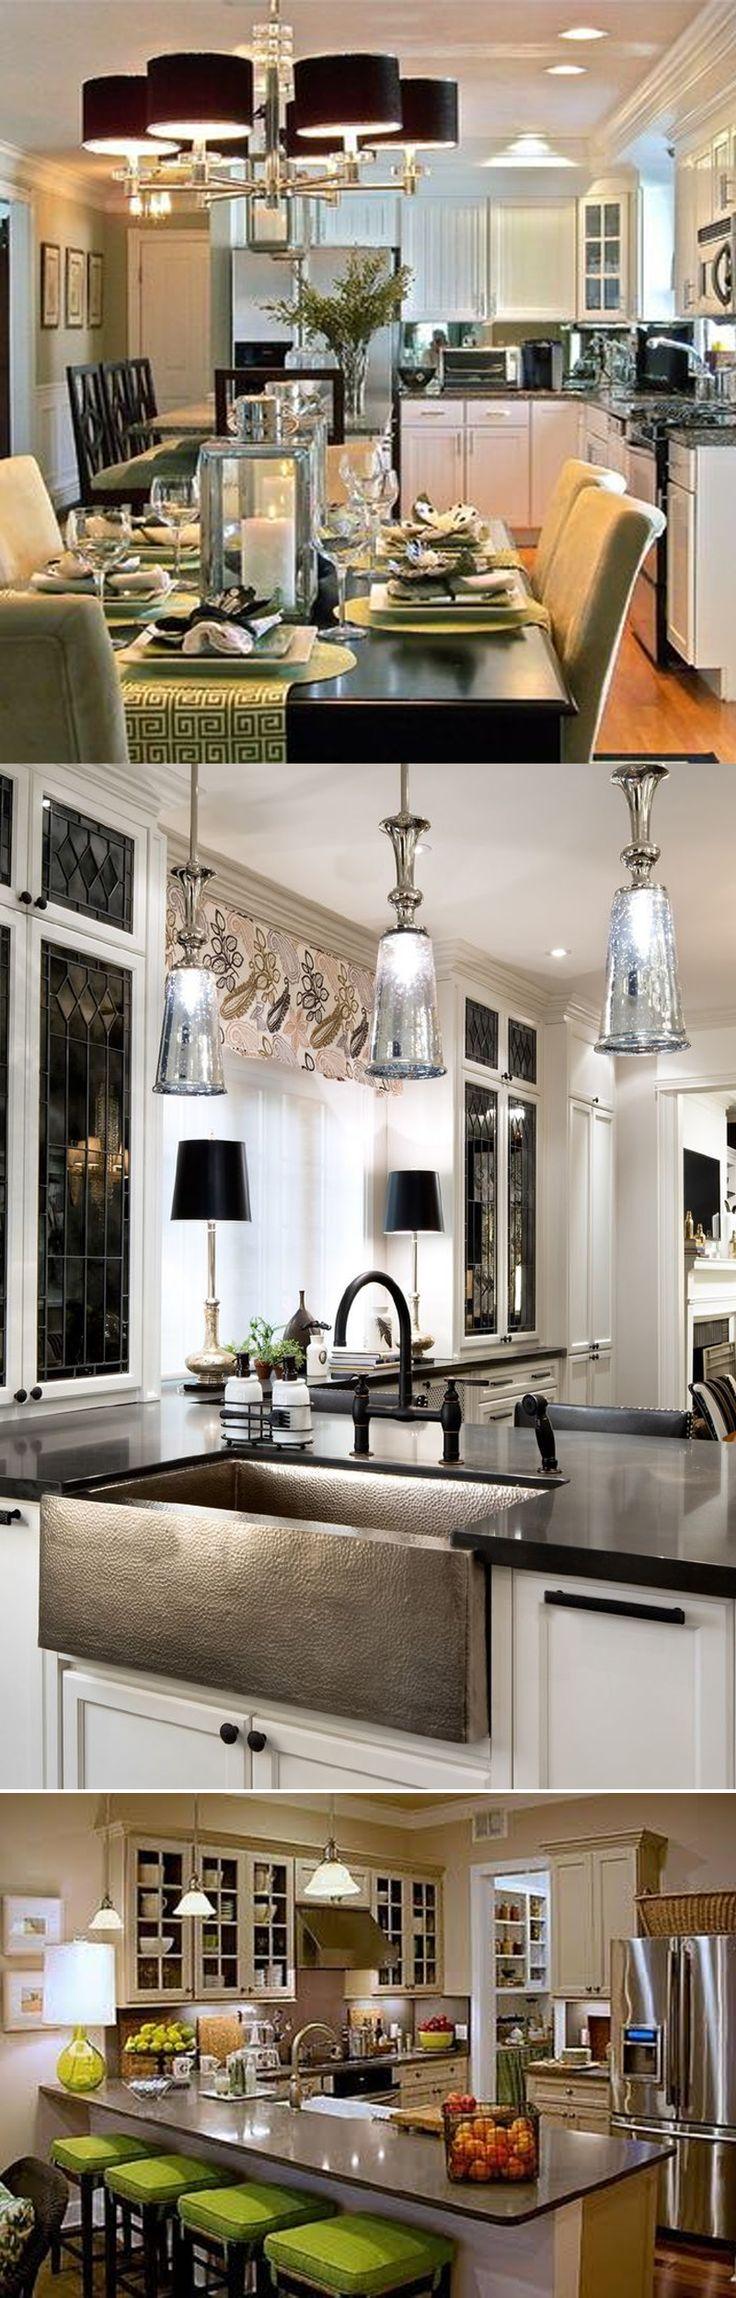 Uncategorized Candice Olson Kitchen Designs 364 best candice olsonhgtv design images on pinterest home decor and spaces